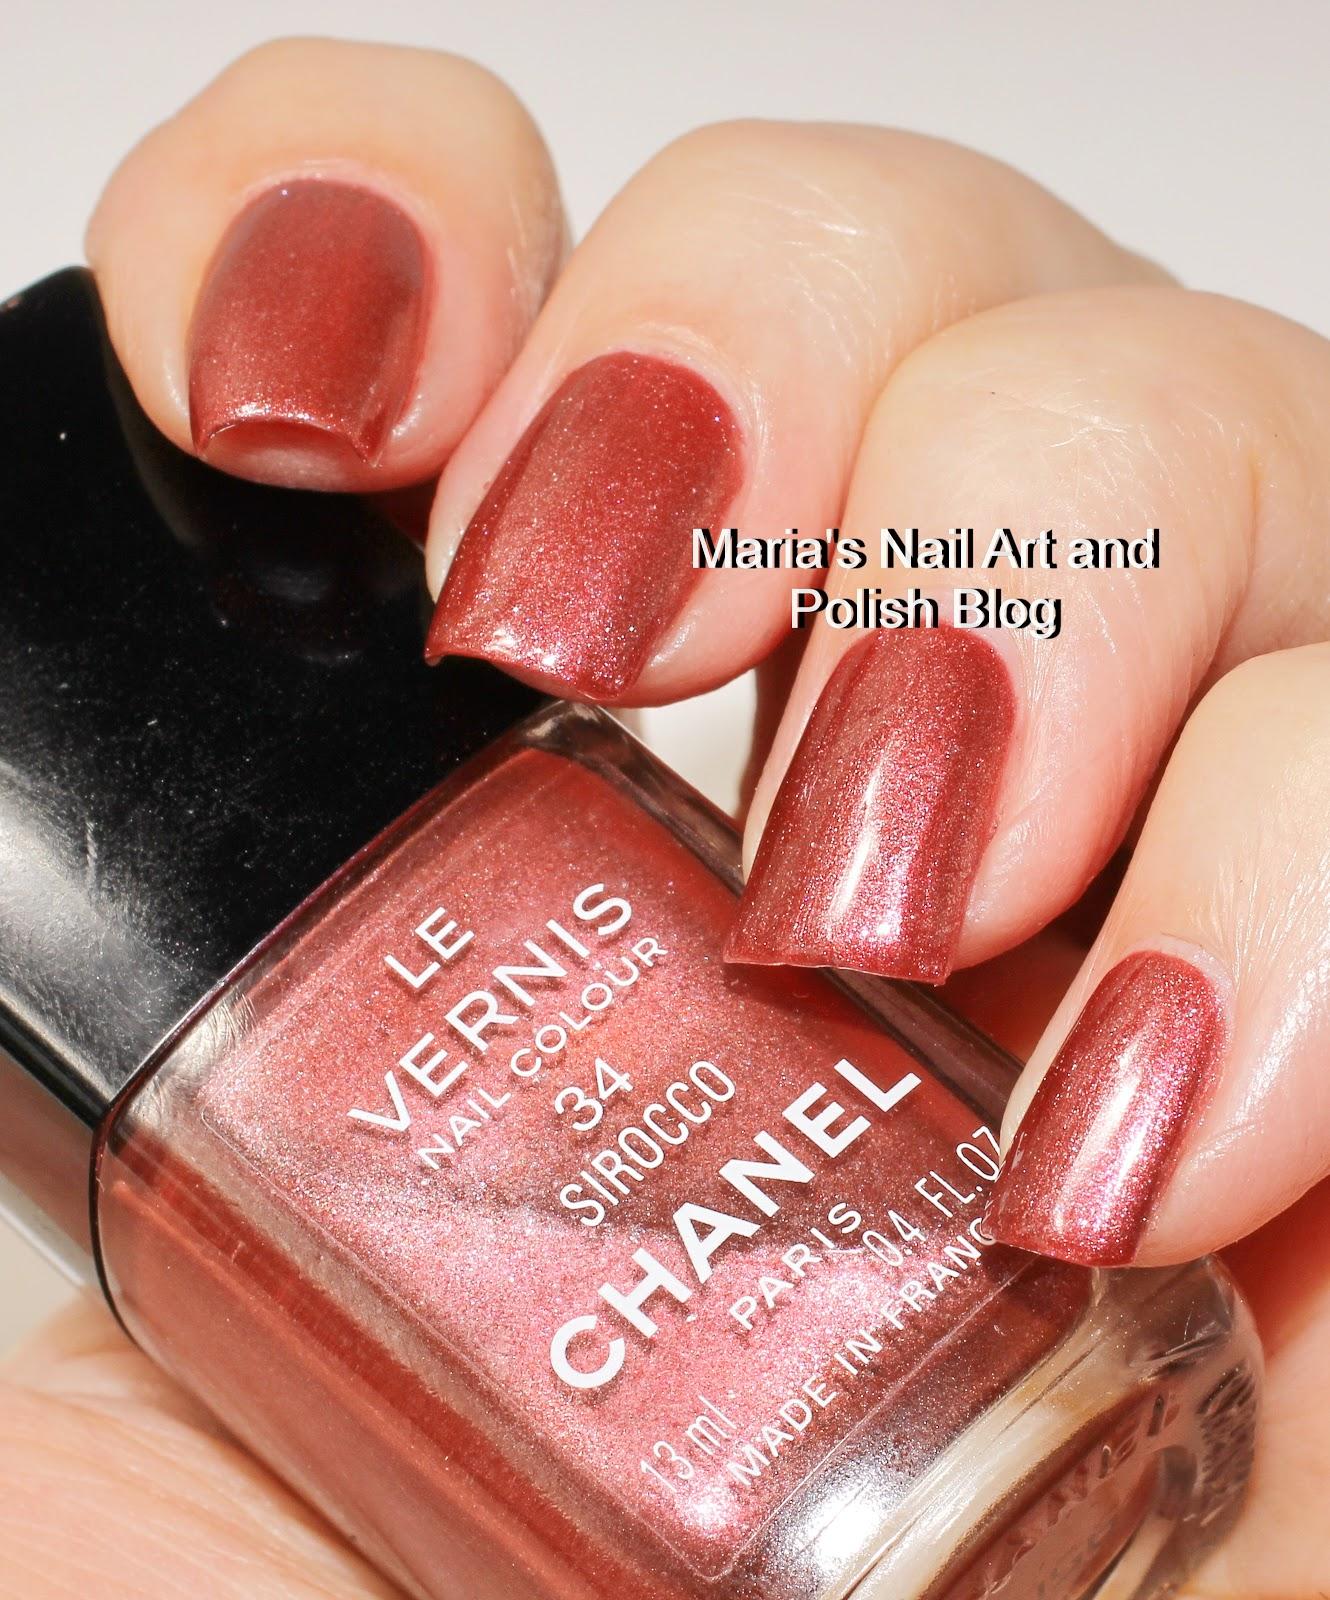 Marias nail art and polish blog chanel sirocco 34 2000 chanel sirocco 34 2000 prinsesfo Choice Image